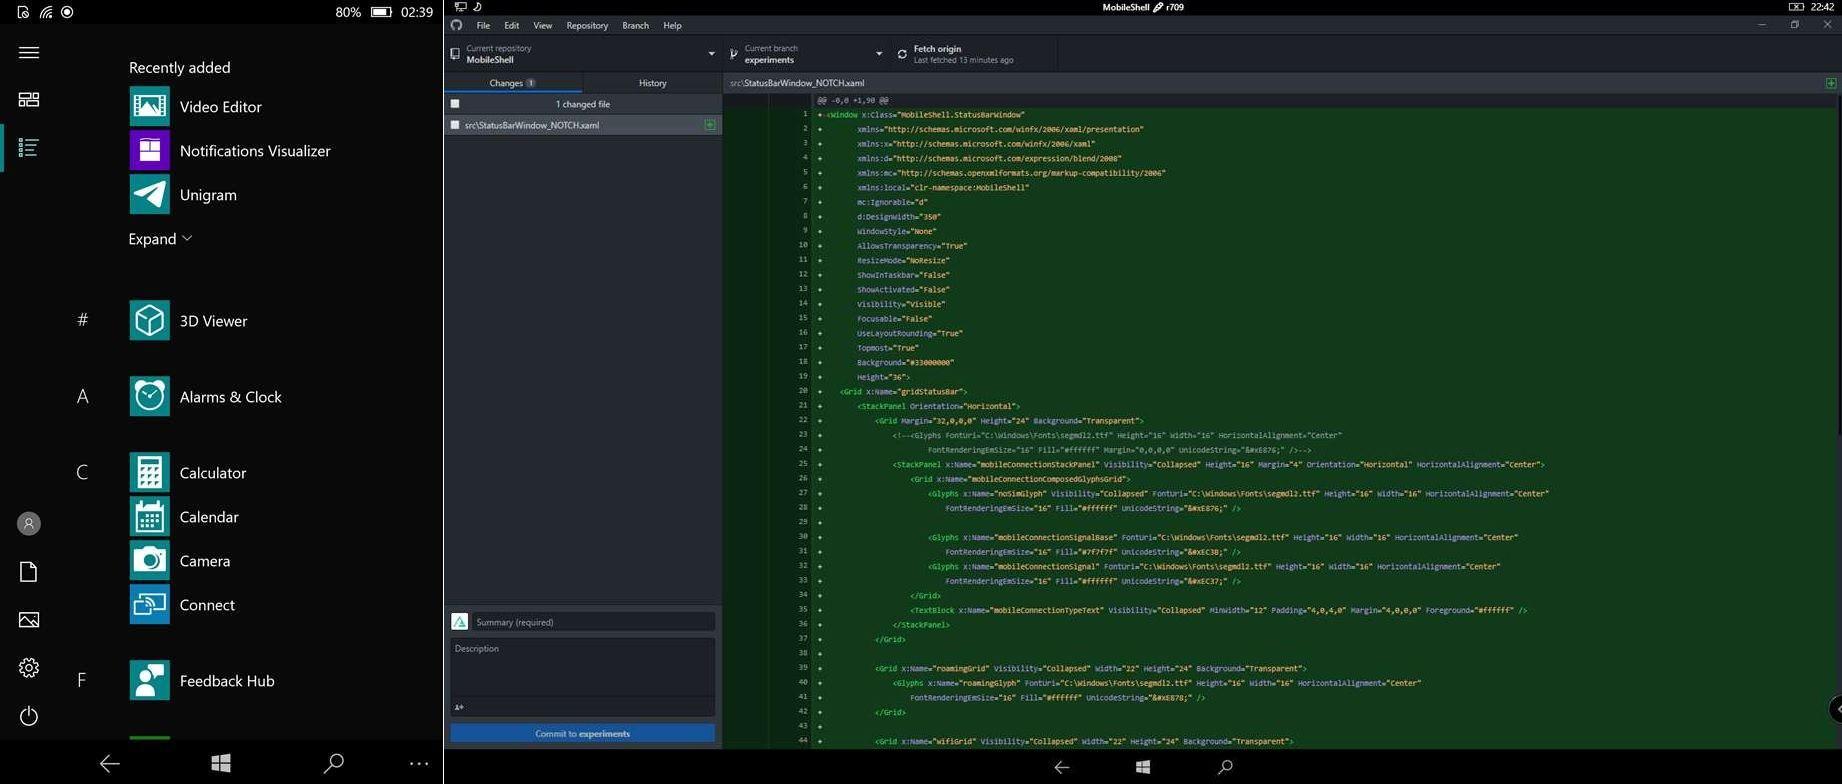 . Windows 10 for ARM MobileShell App Arrives on the